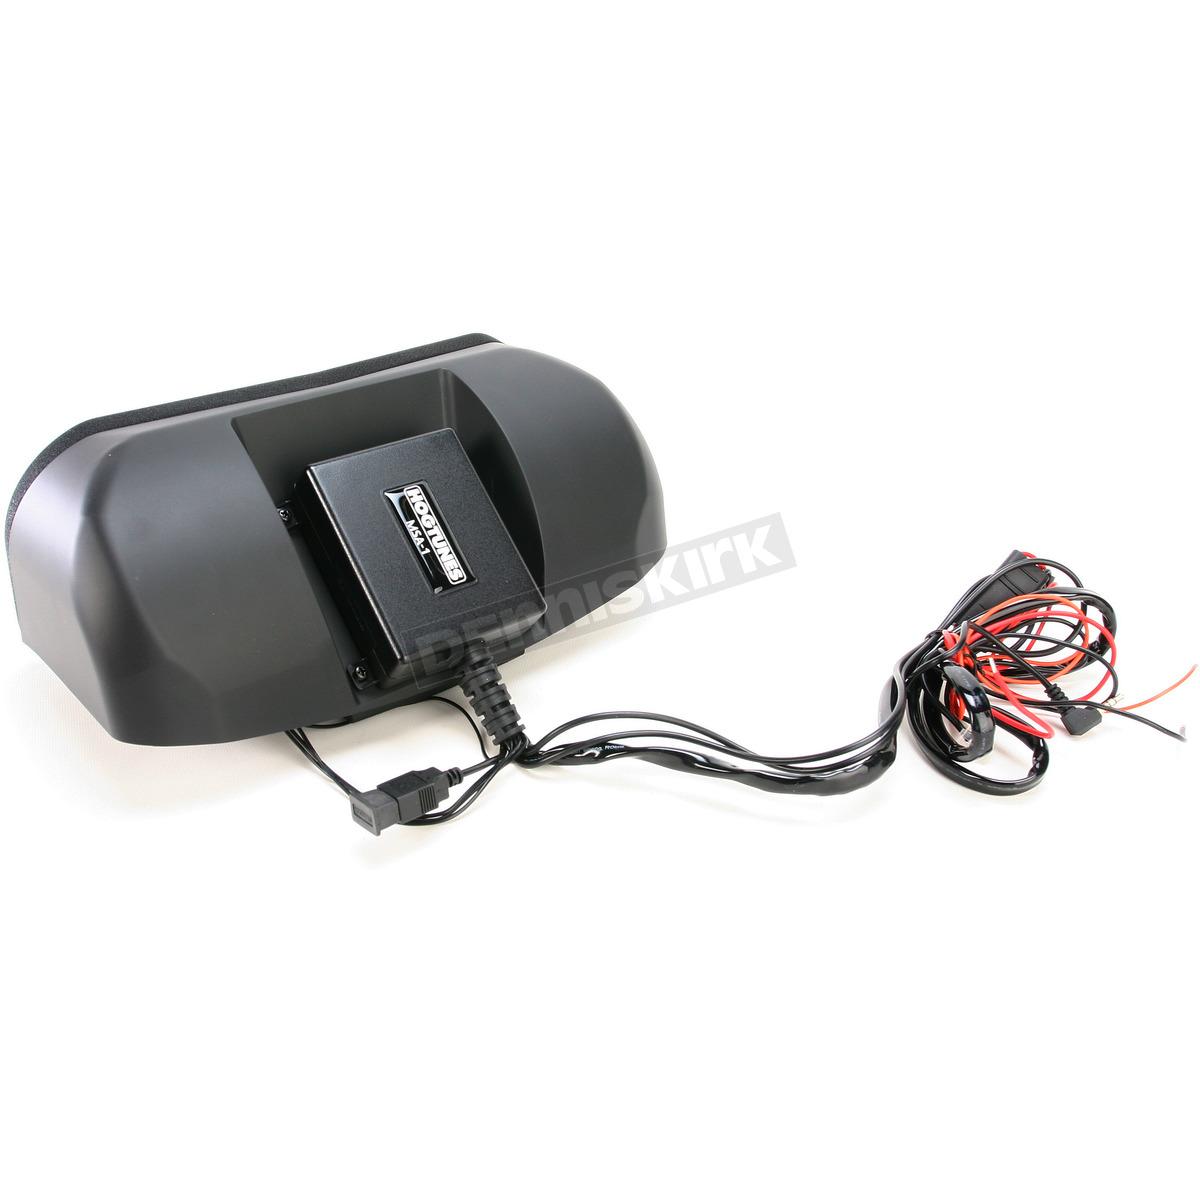 hight resolution of hogtunes memphis shades batwing speaker system kit msa 1 harley motorcycle dennis kirk